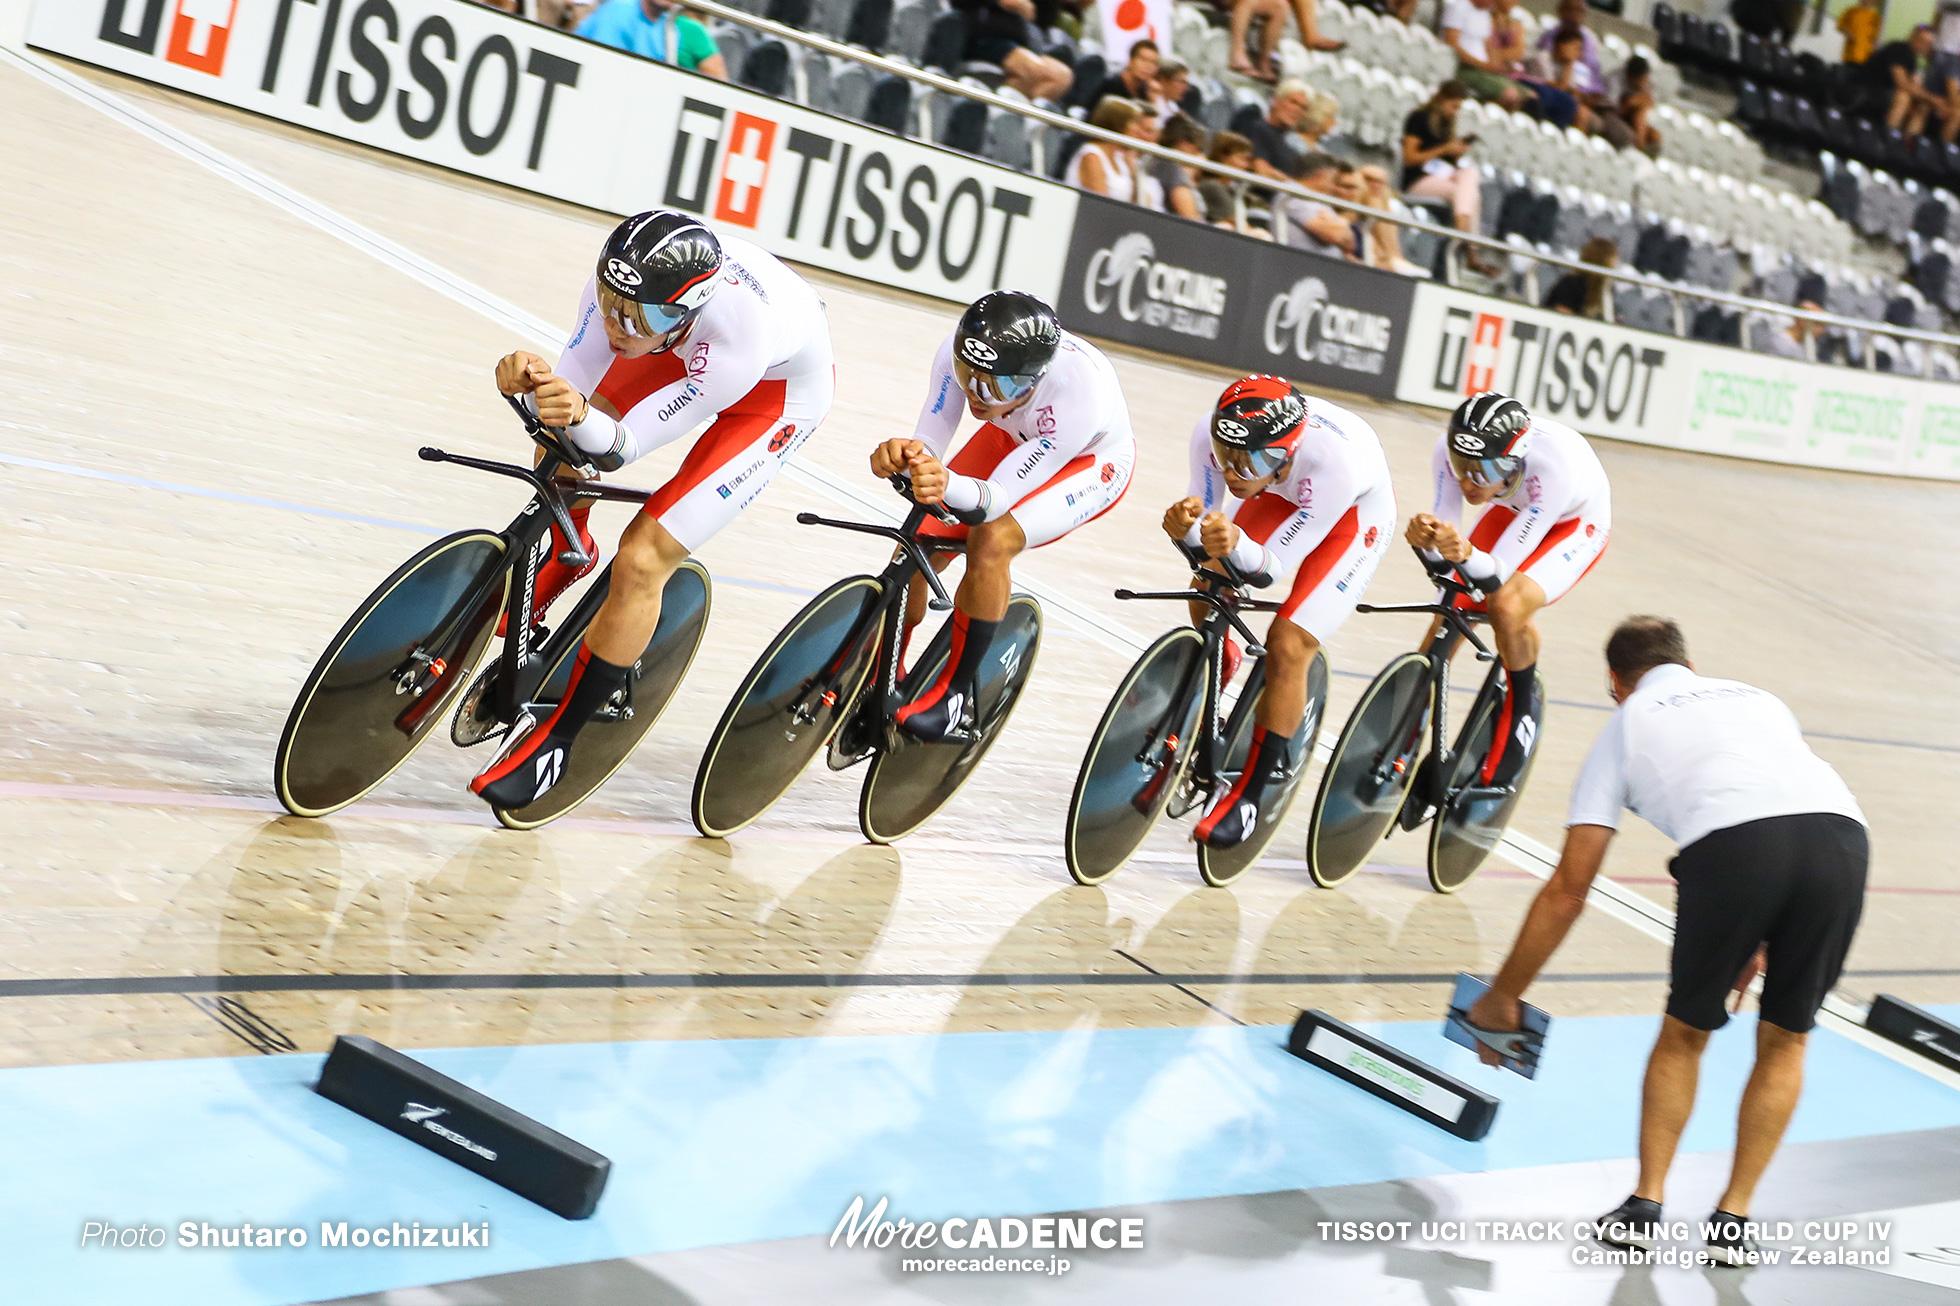 Qualifying / Men's Team Pursuit / TISSOT UCI TRACK CYCLING WORLD CUP IV, Cambridge, New Zealand, 近谷涼 今村駿介 窪木一茂 沢田桂太郎